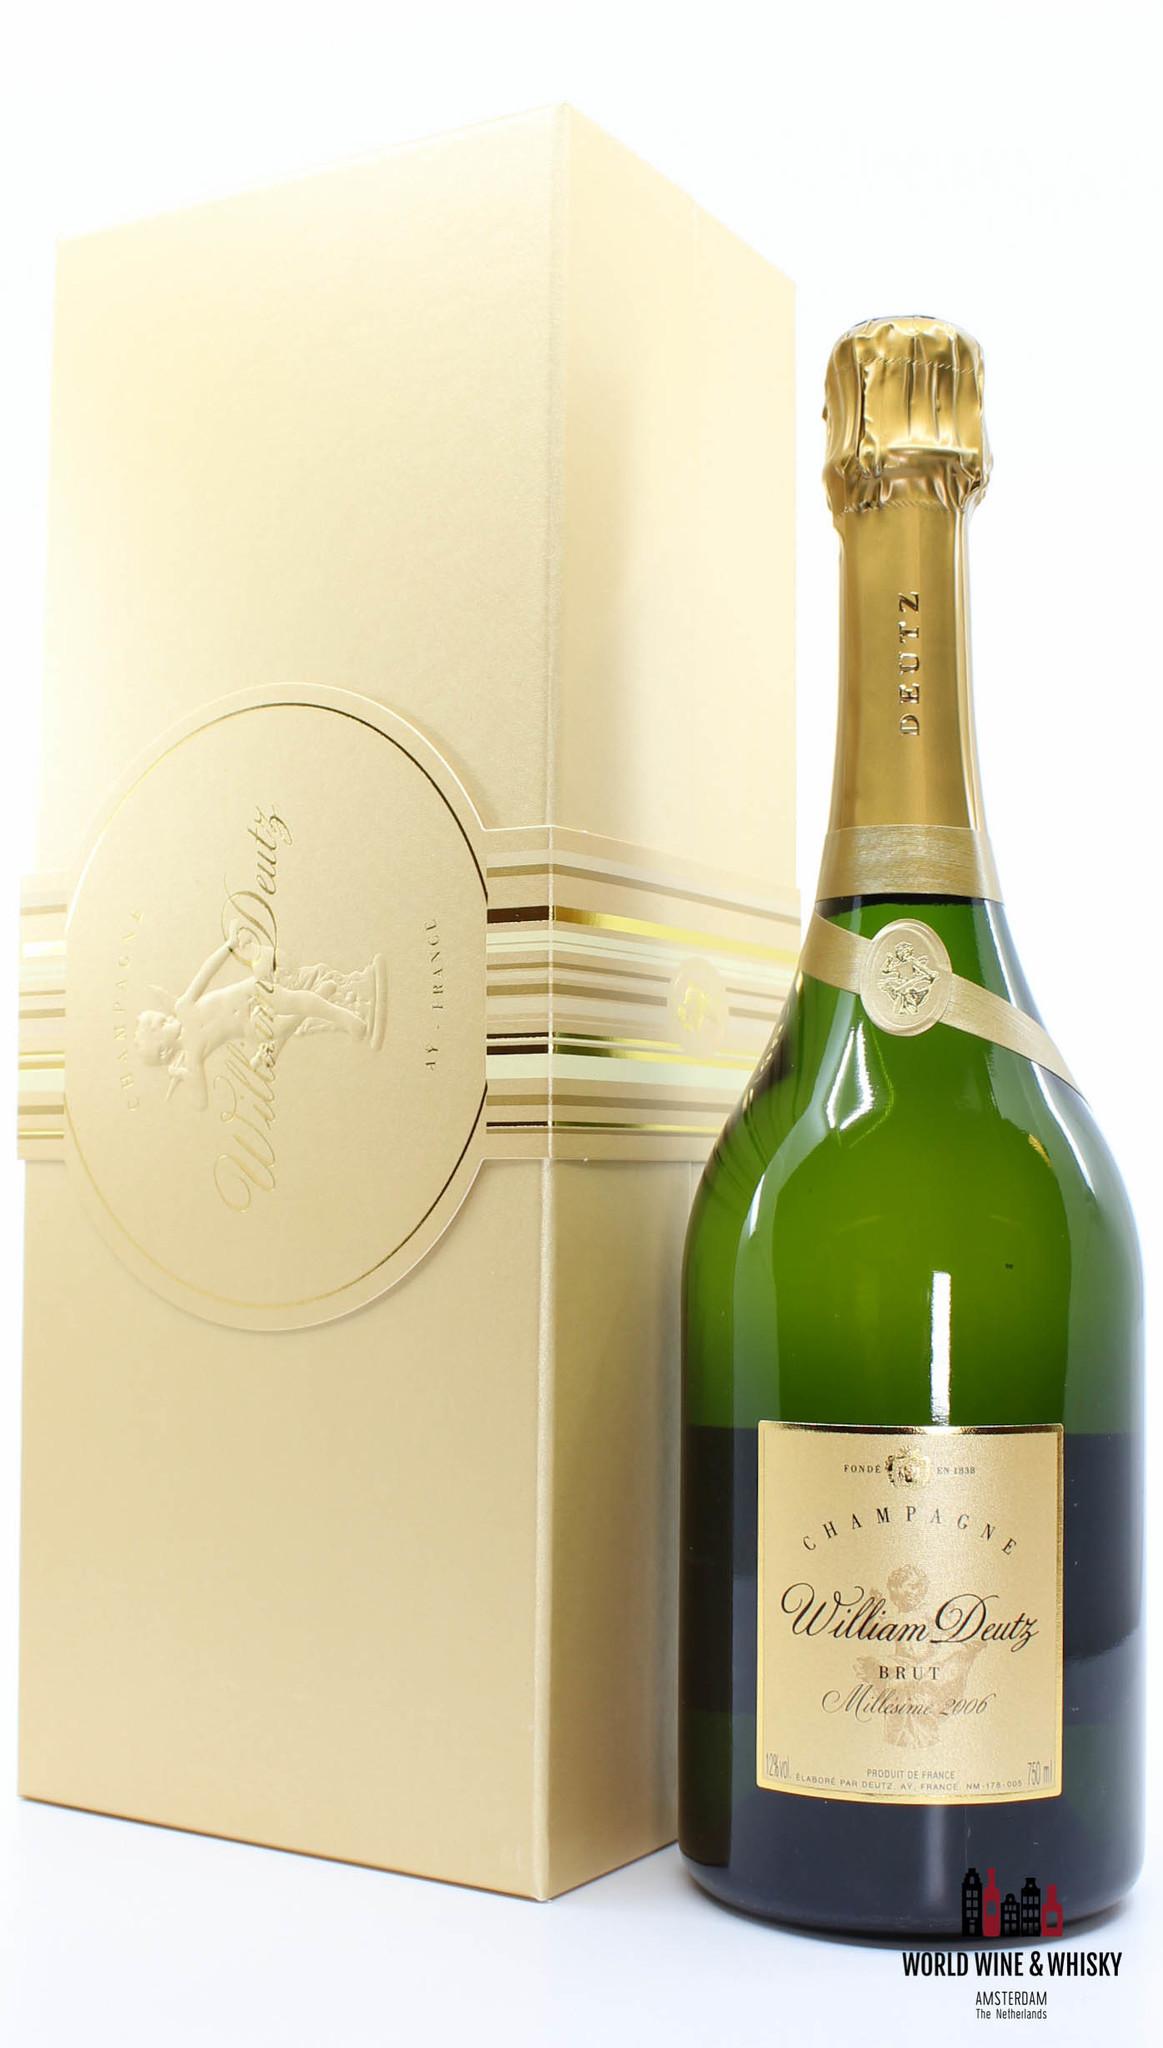 Deutz William Deutz Champagne Brut Millesime 2006 (750 ml)